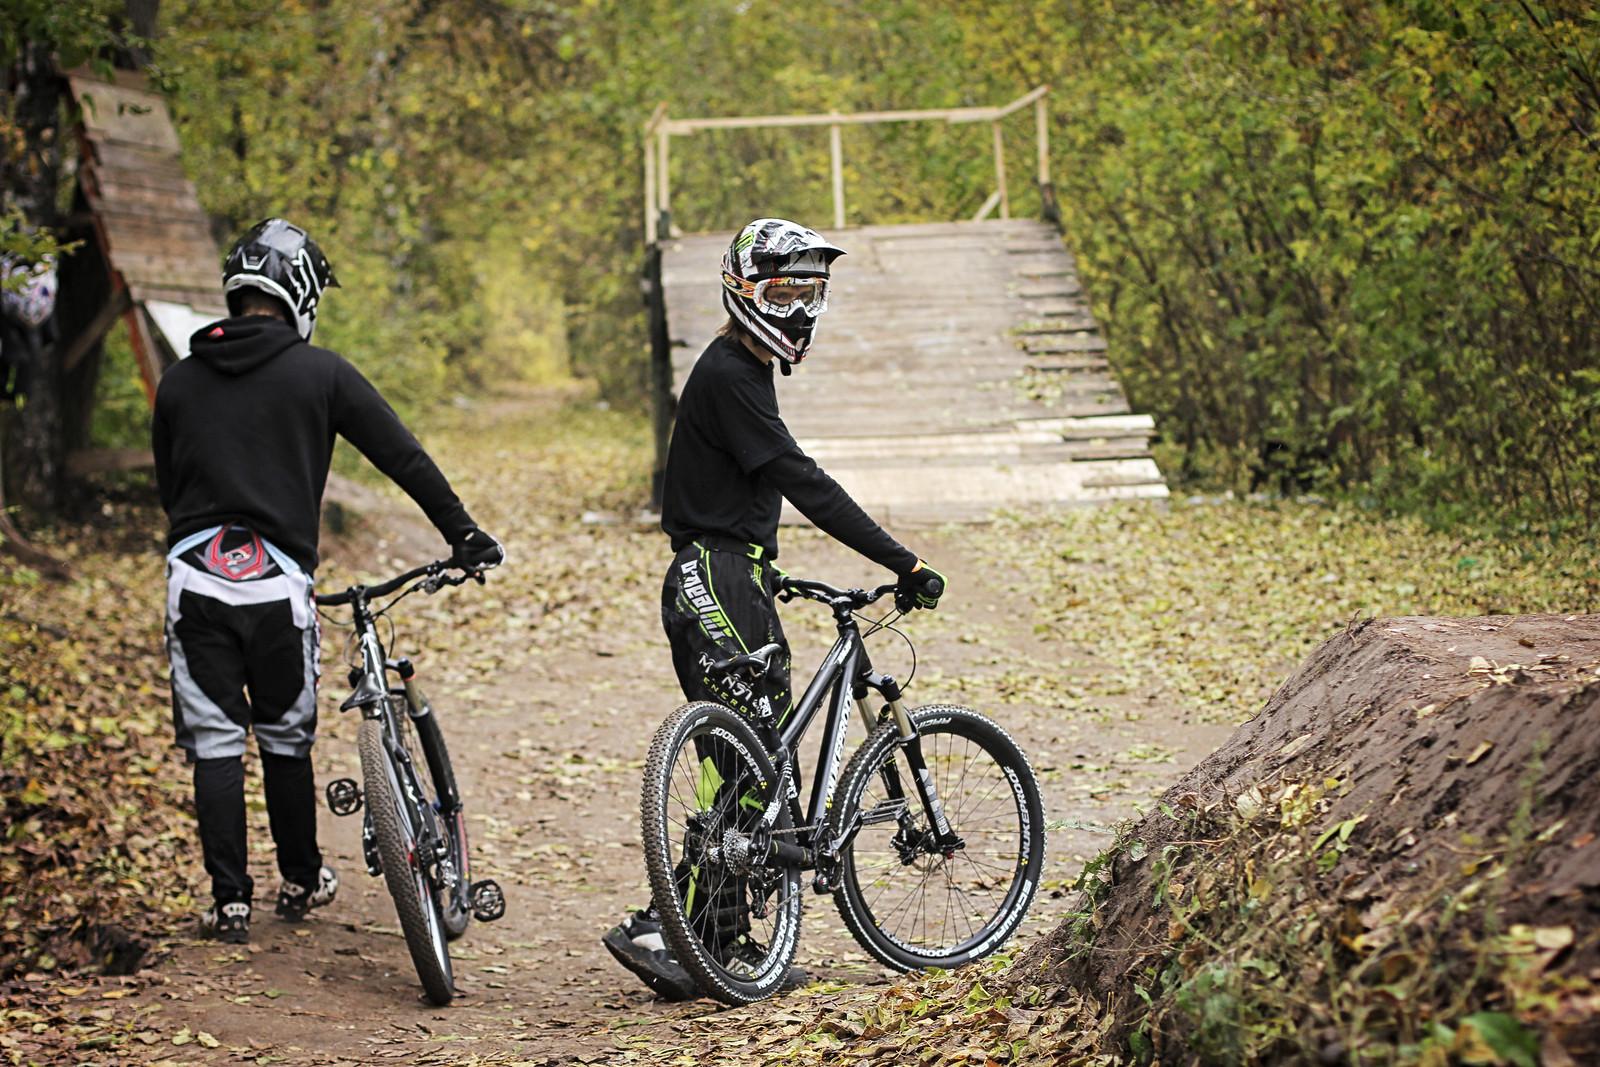 IMG 5059 - YakuT - Mountain Biking Pictures - Vital MTB